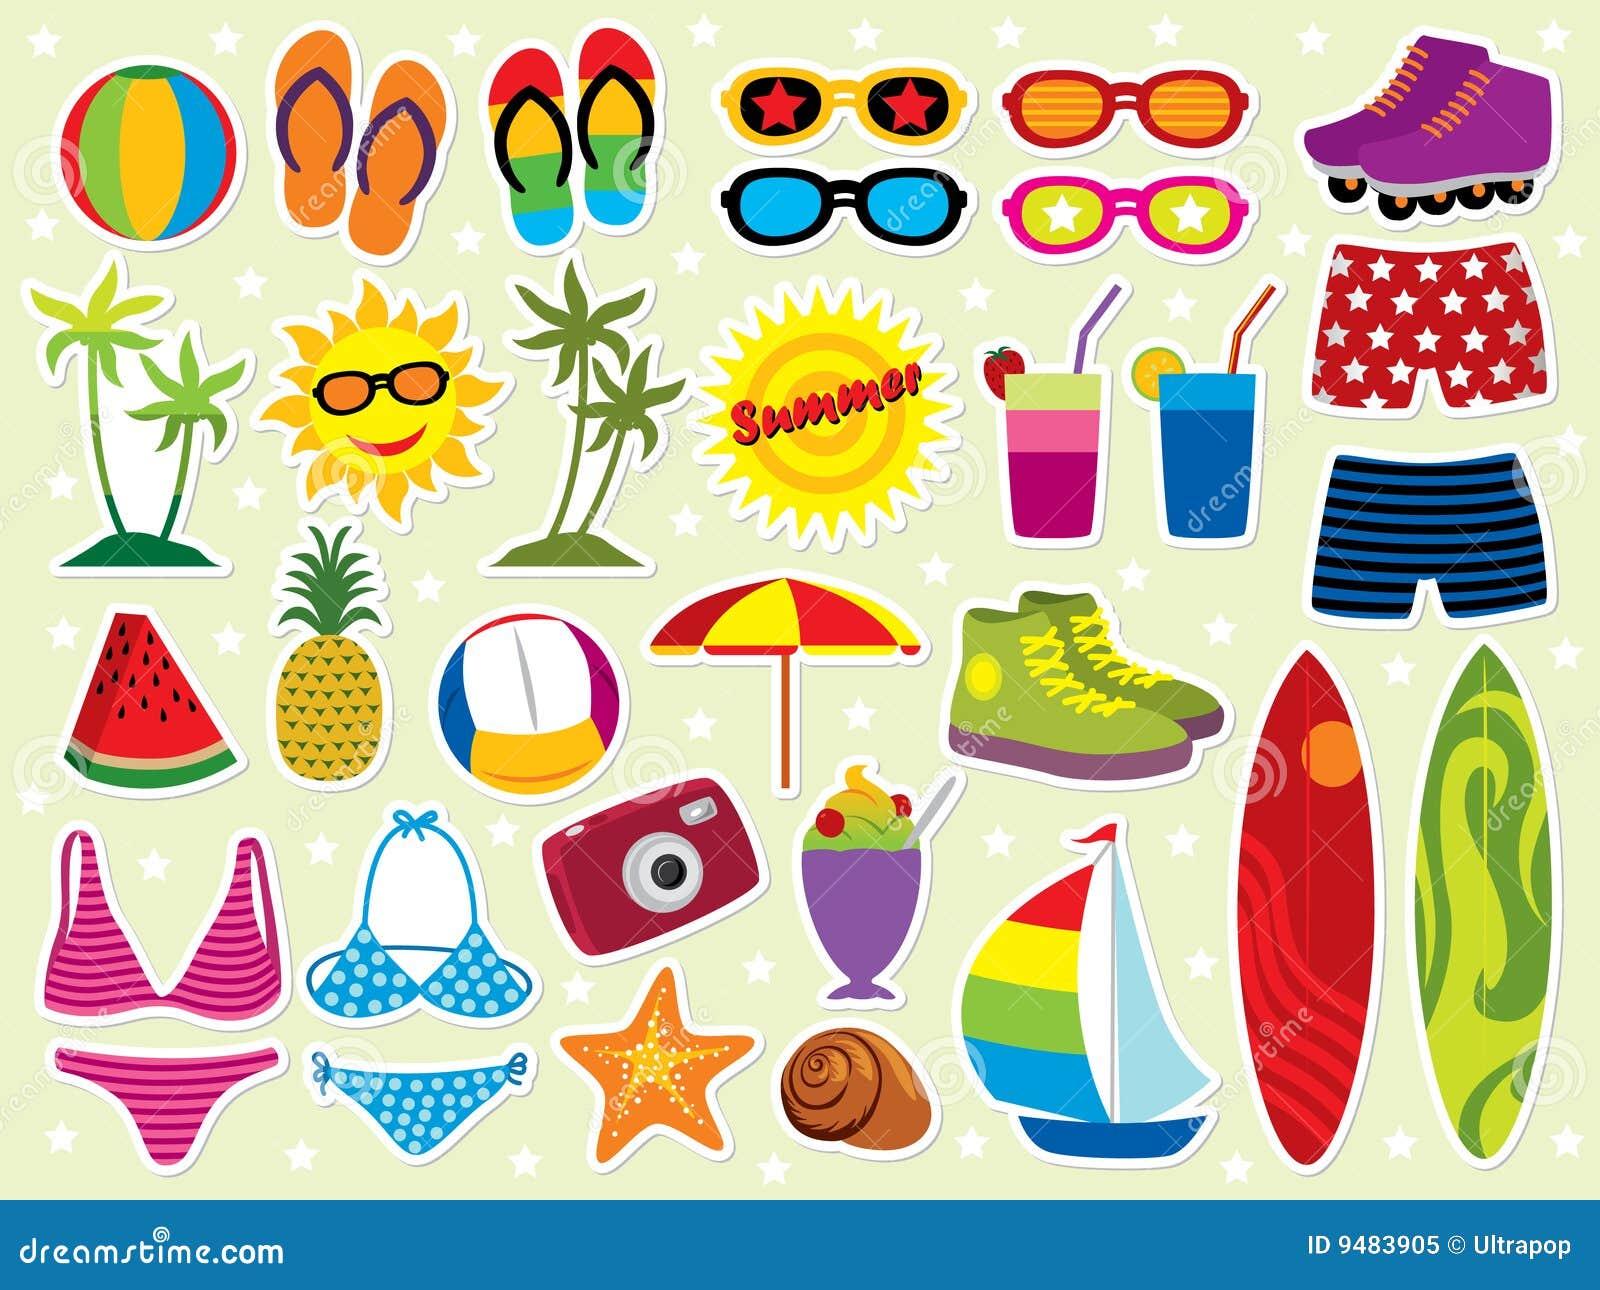 Summer holidays icon set. Please visit my portfolio for more summer